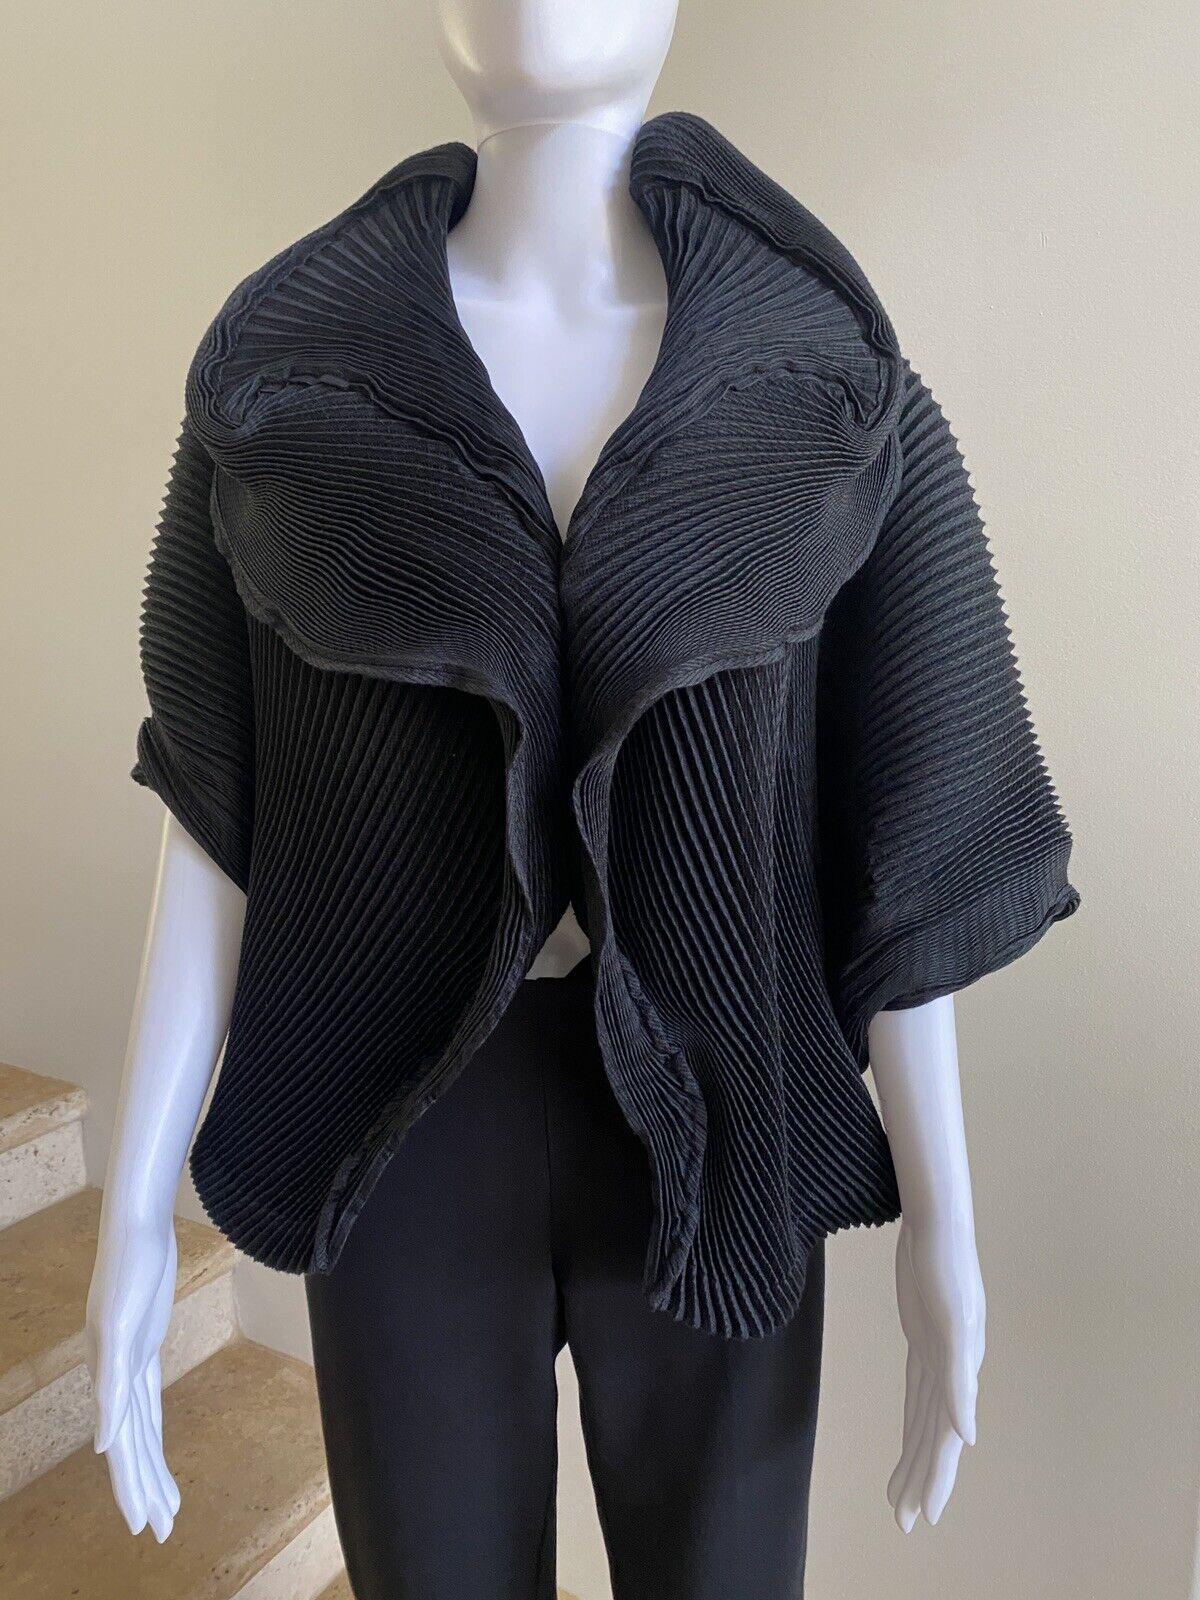 NWT ,960 ISSEY MIYAKE Black Optical Pleated Jacket, Size 2/Small